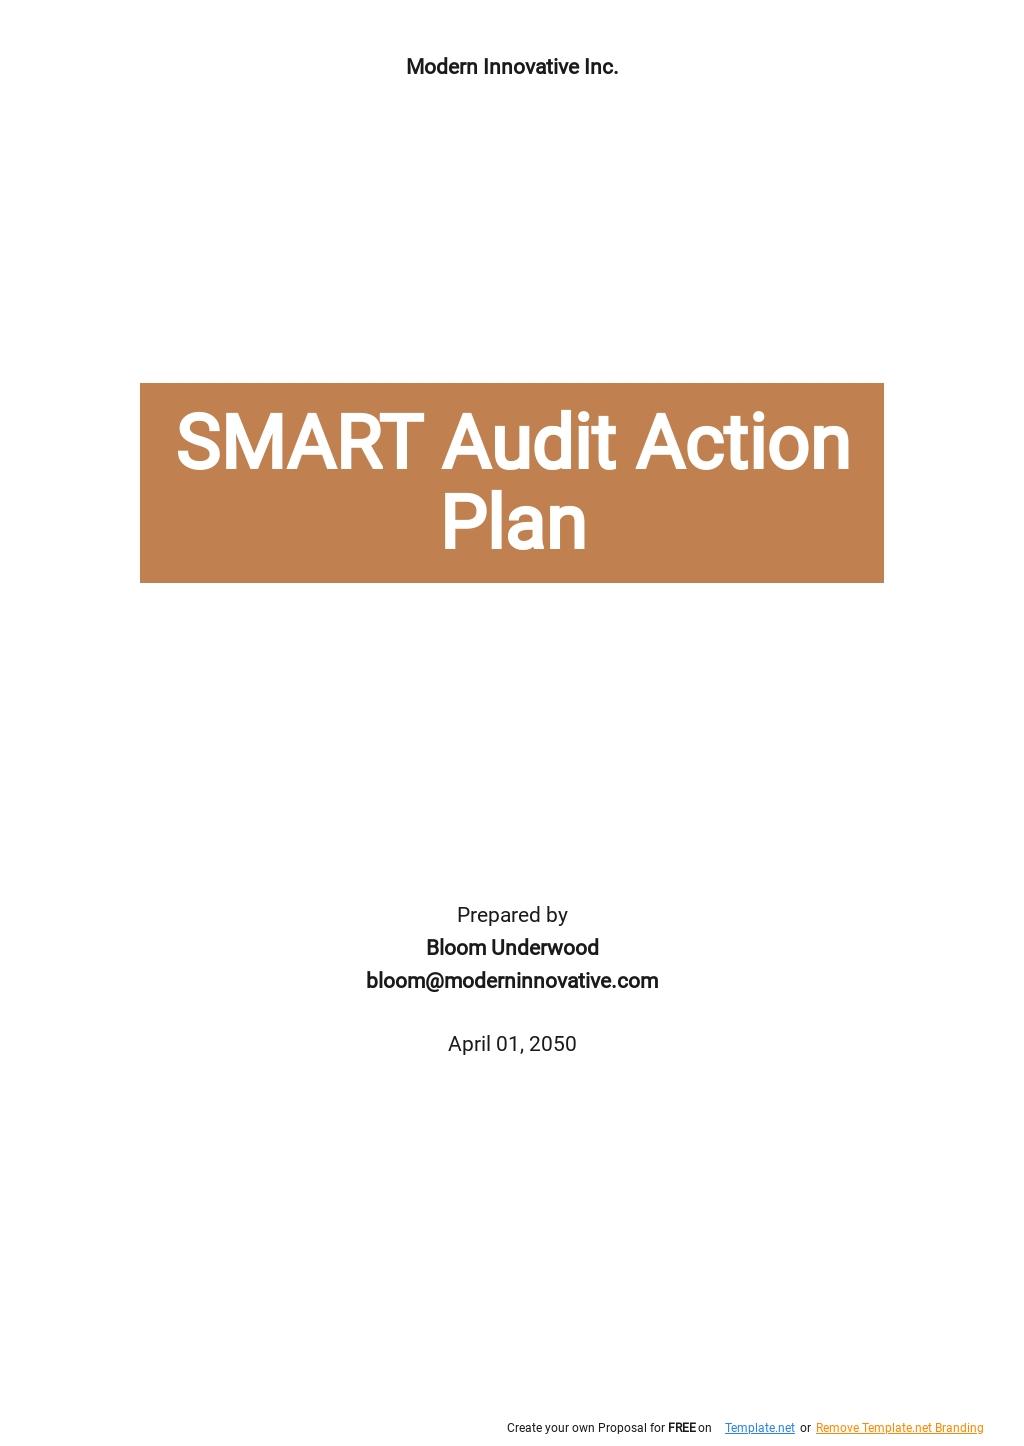 Smart Audit Action Plan Template.jpe